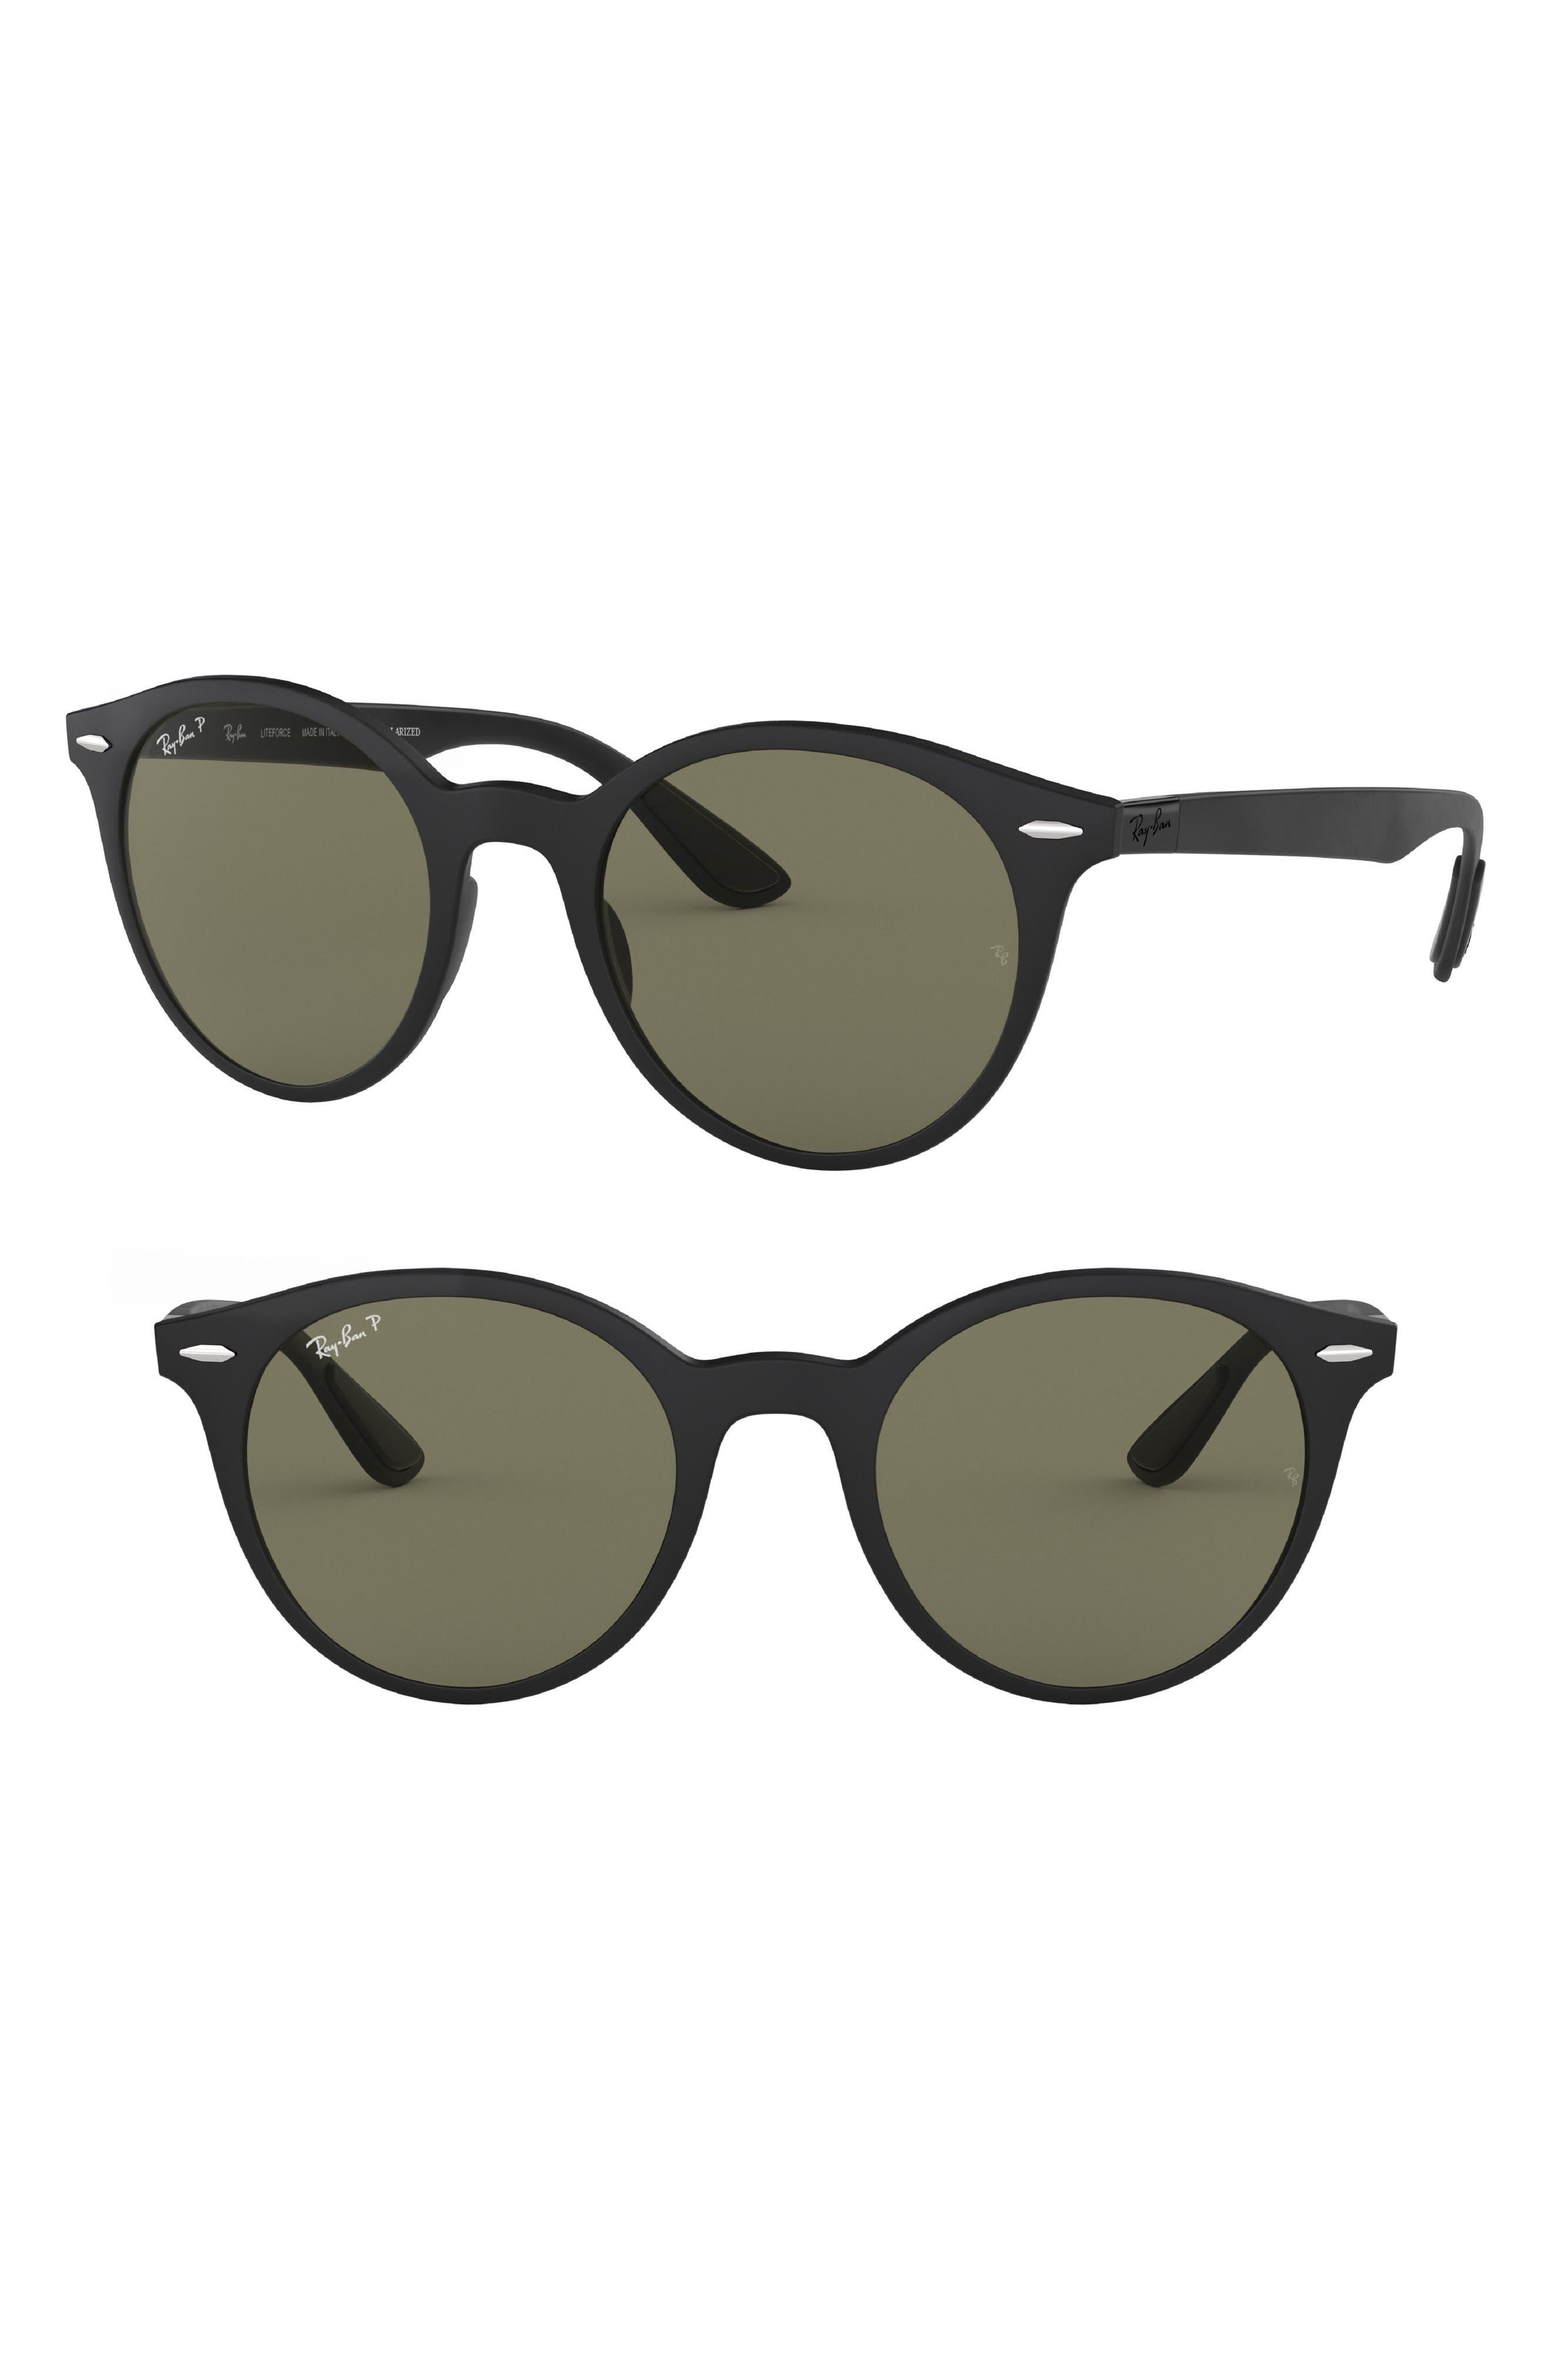 Phantos 50mm Polarized Sunglasses,                         Main,                         color, MATTE BLACK